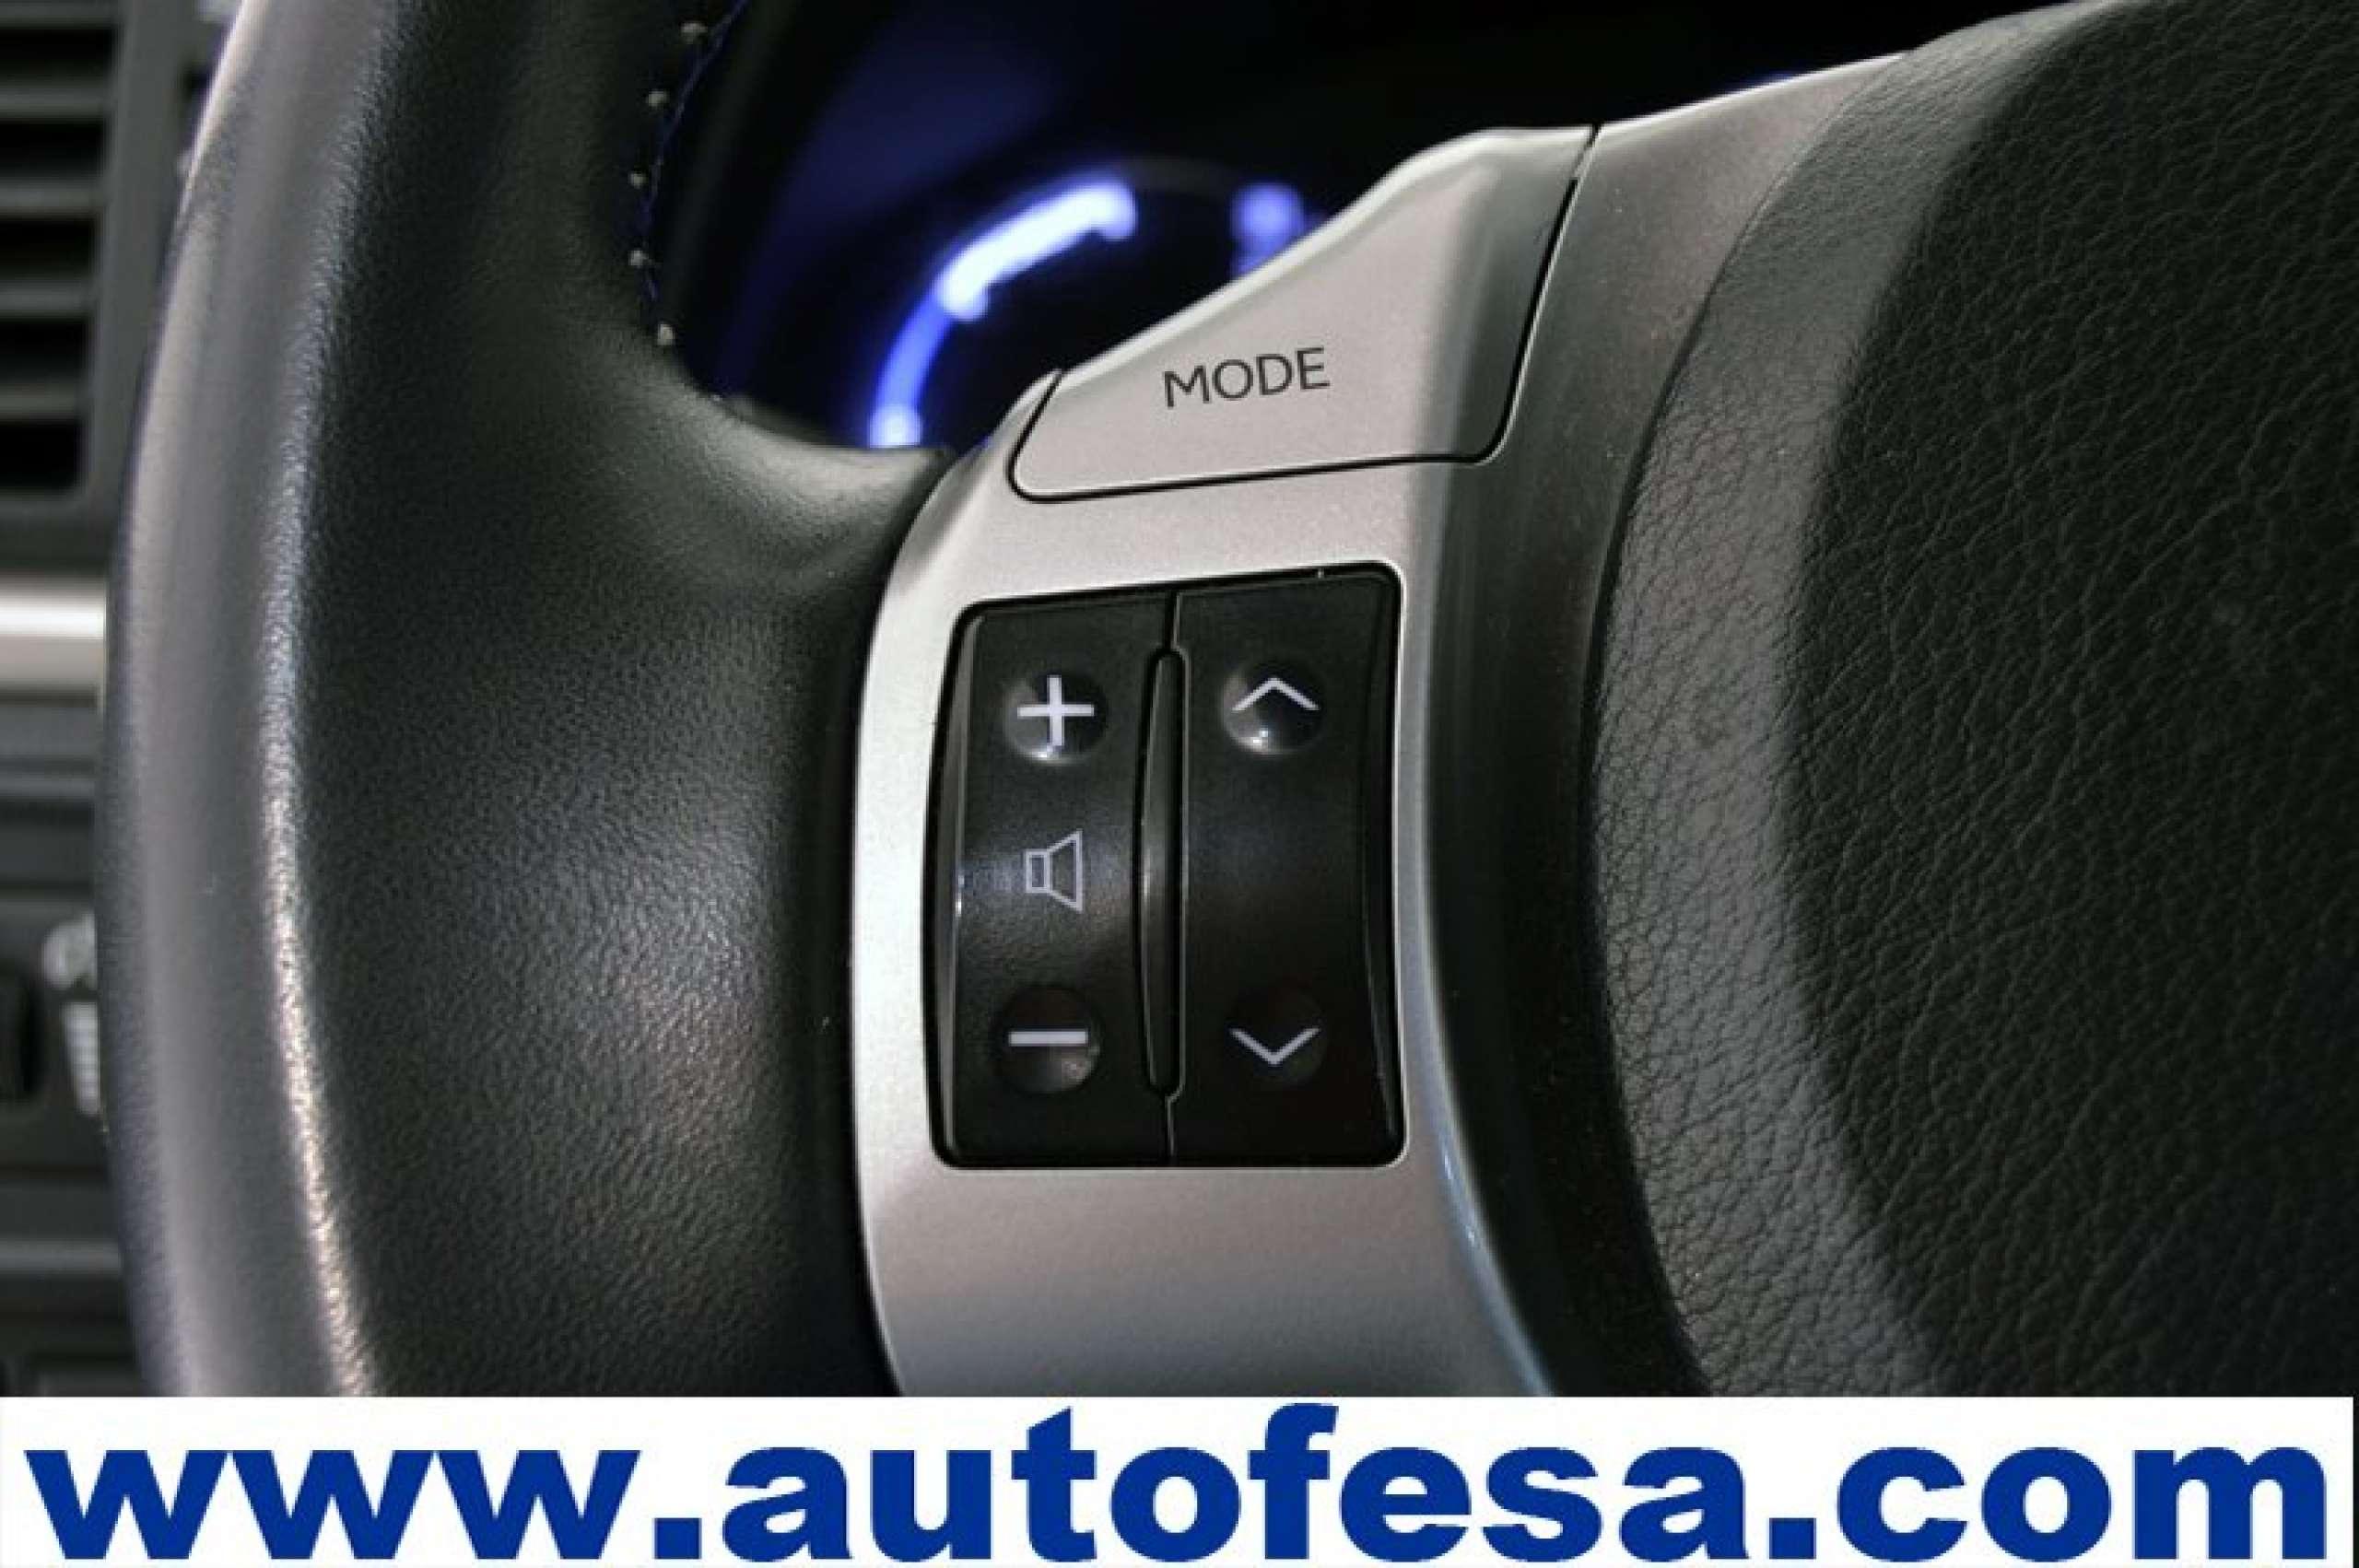 Lexus Ct 200h 1.8 136cv Eco Auto 5p - Foto 22